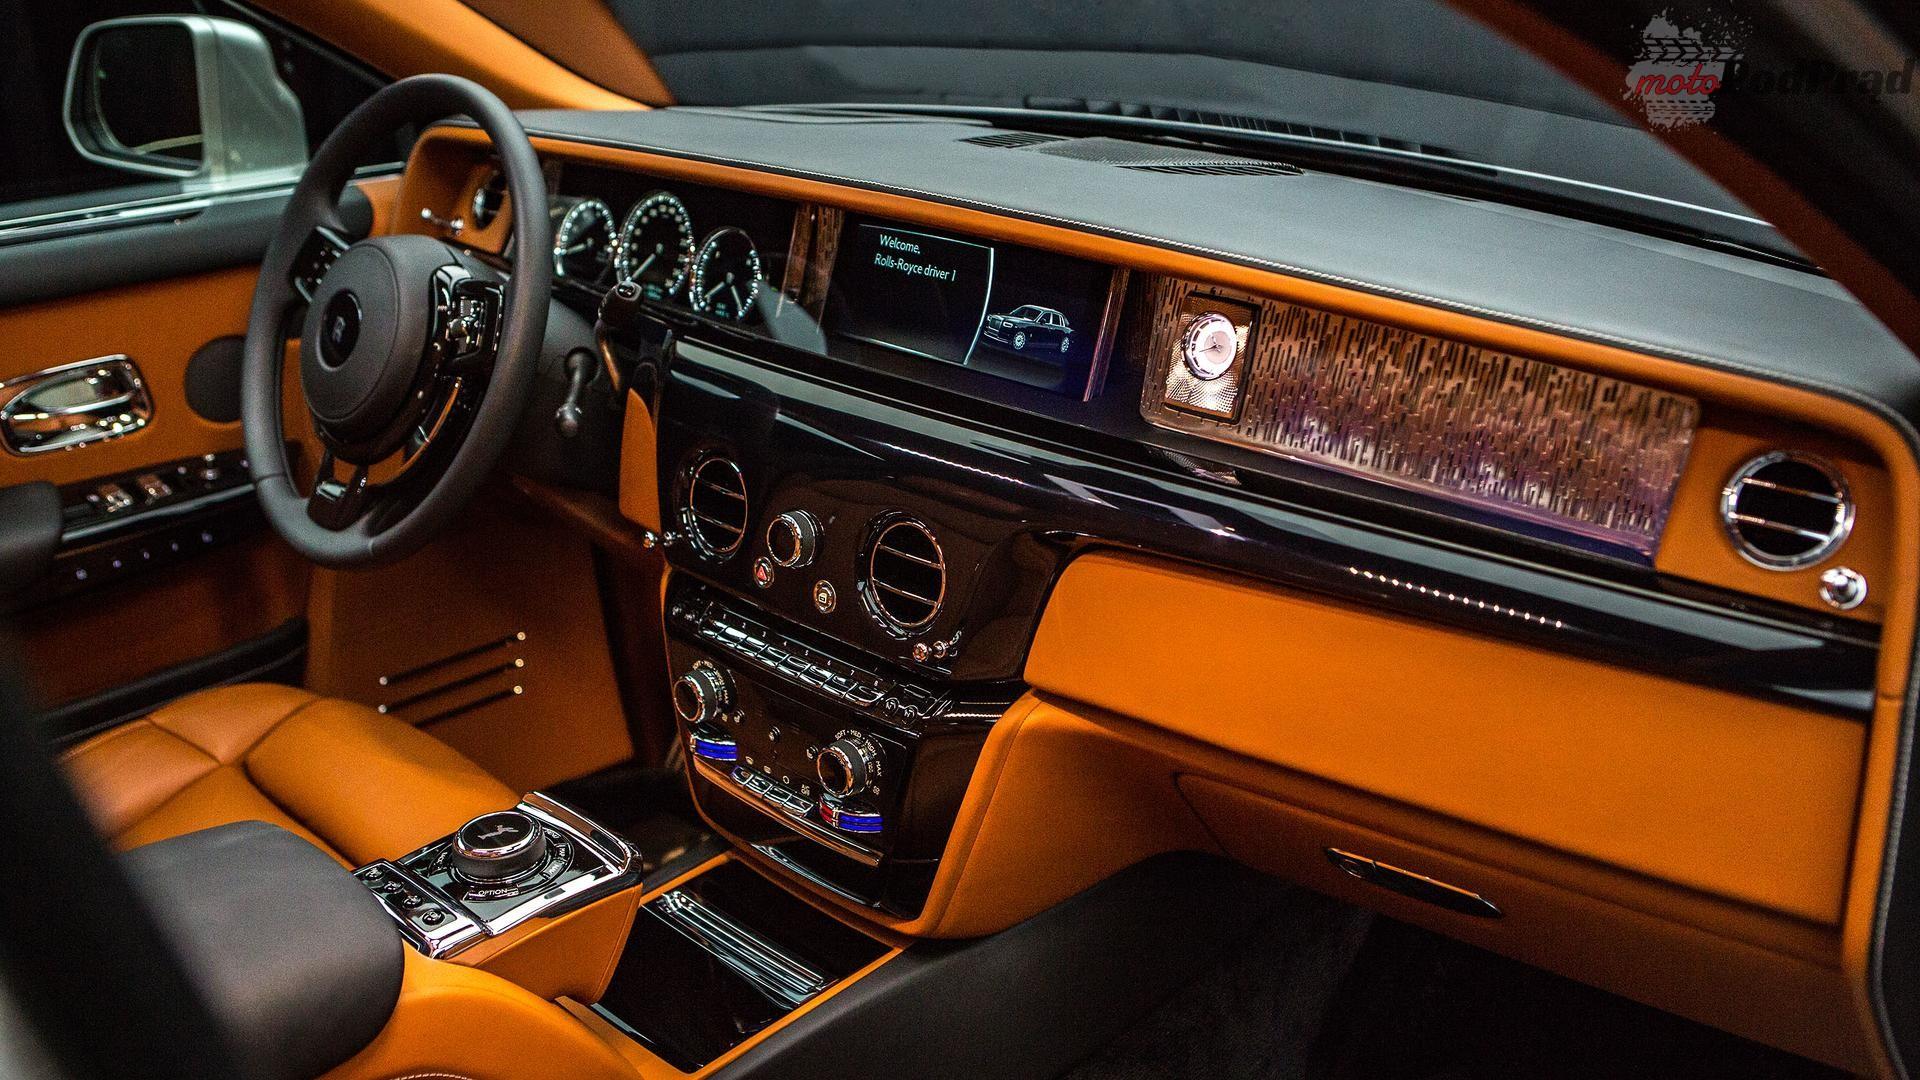 2018 rolls royce phantom Rolls Royce Phantom: czysta dominacja